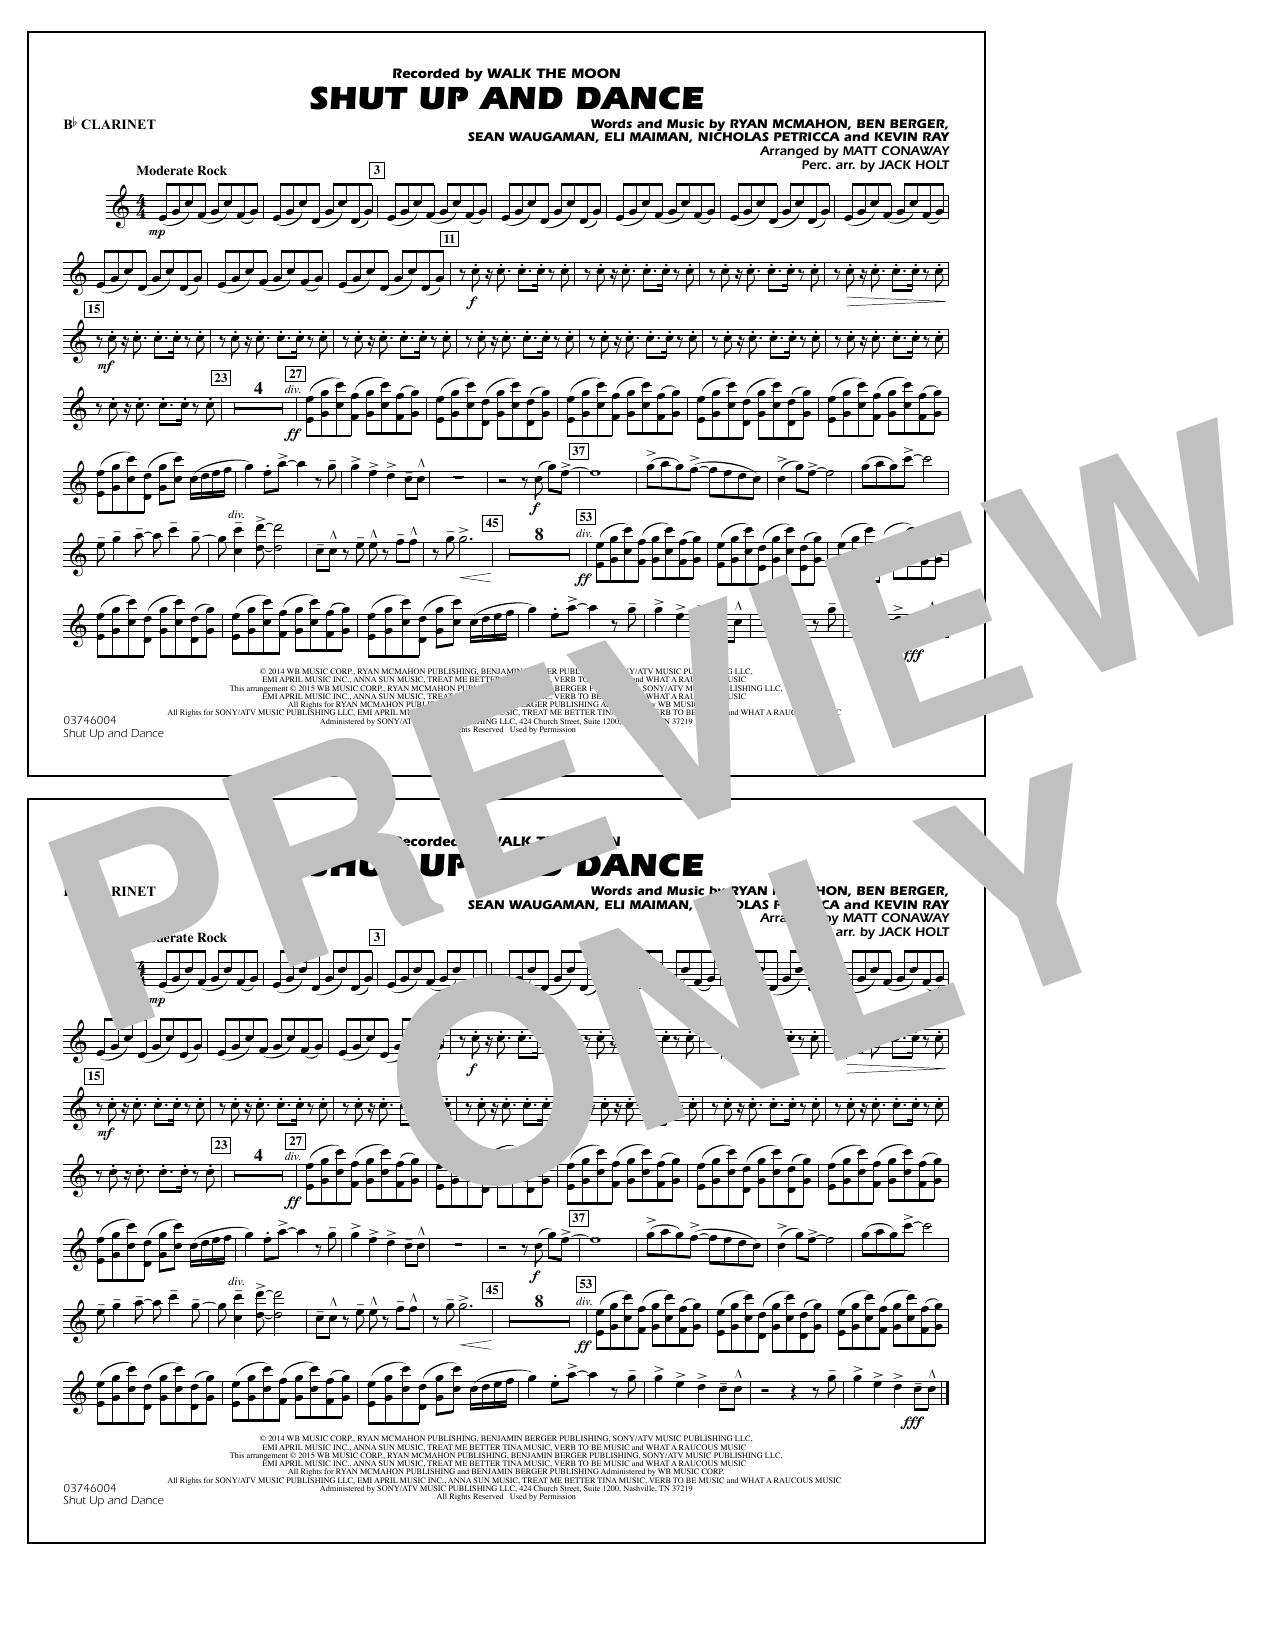 Walk The Moon Shut Up and Dance (Arr. Matt Conaway) - Bb Clarinet sheet music notes and chords